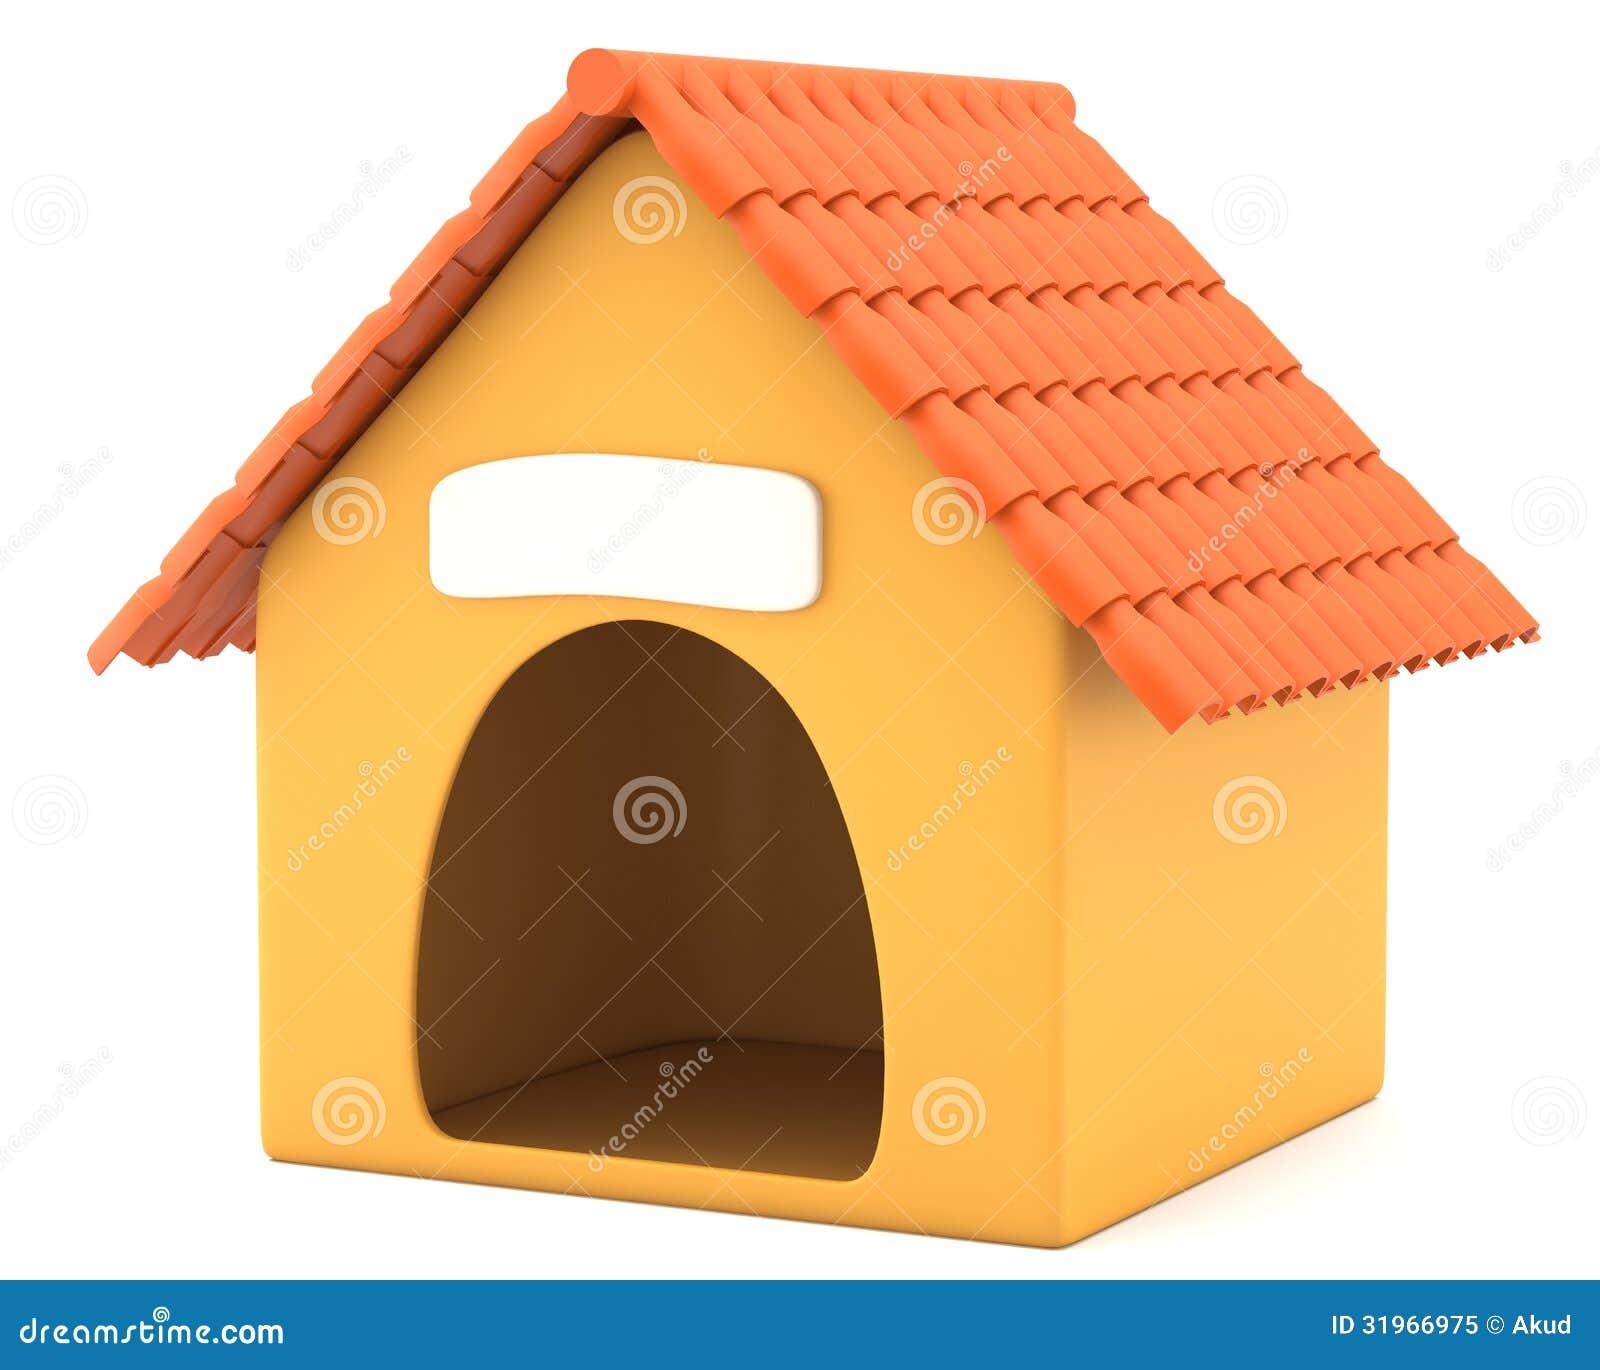 Cartoon Styled Doghouse Royalty Free Stock Photo Image